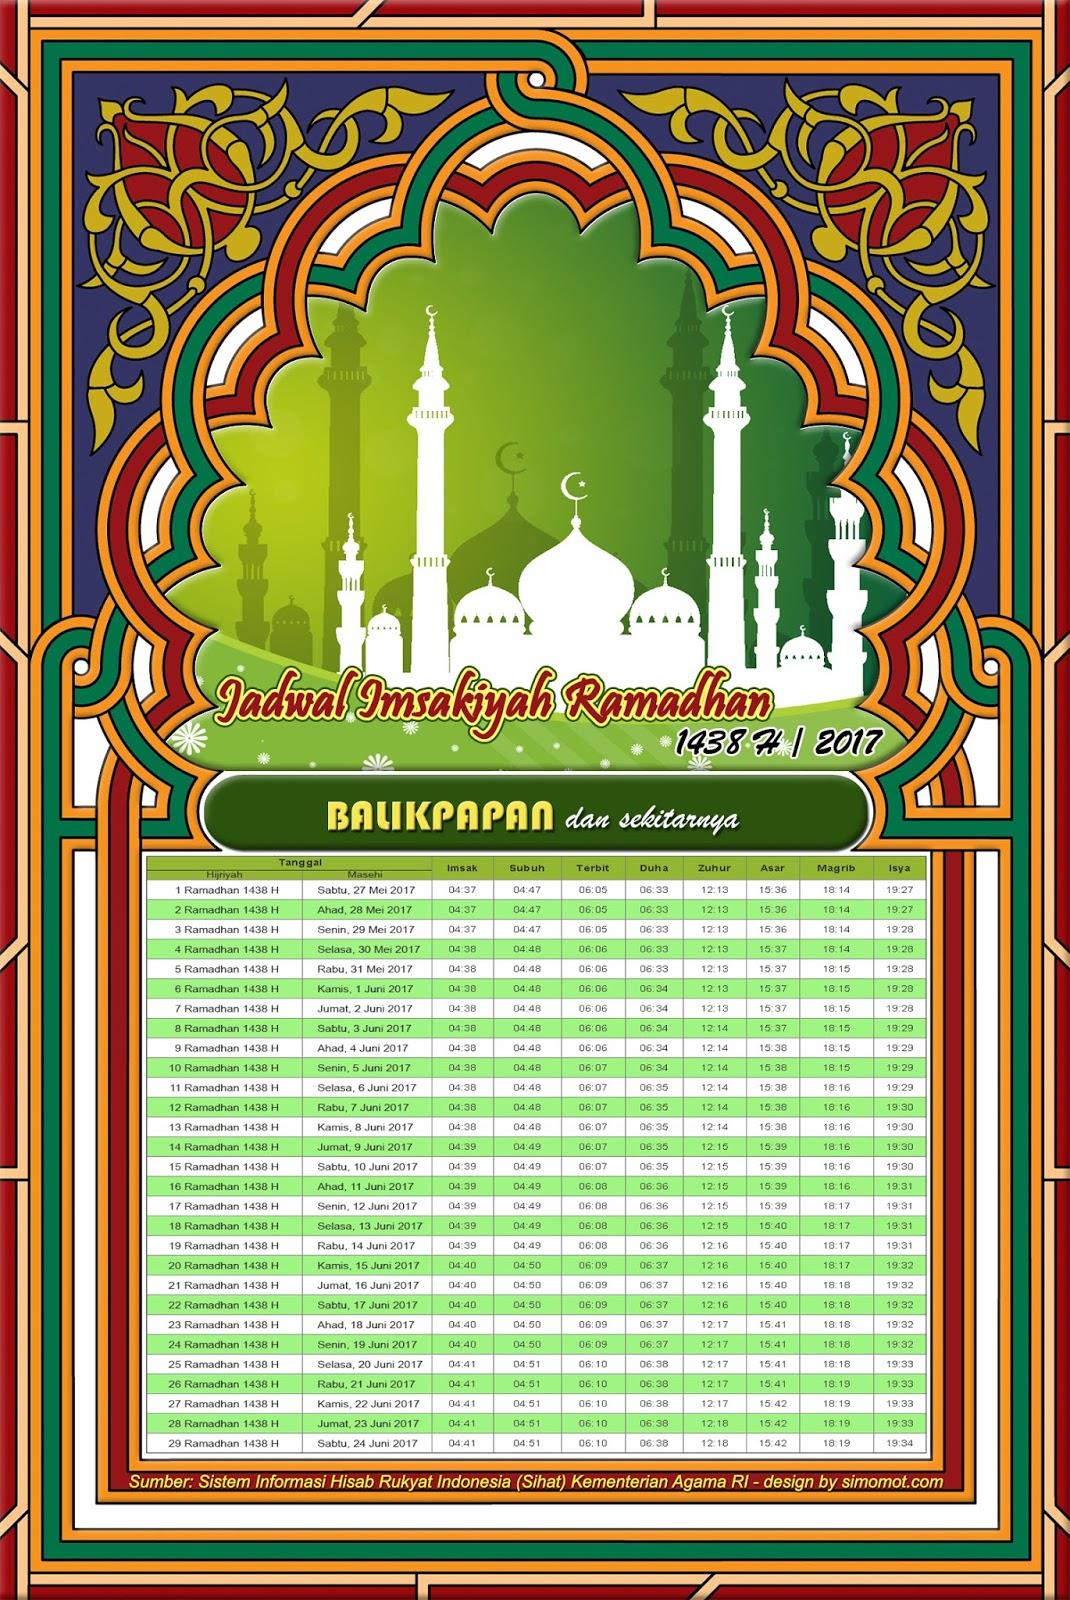 Jadwal Imsakiyah Balikpapan 2017 -  Ramadhan 1438 H